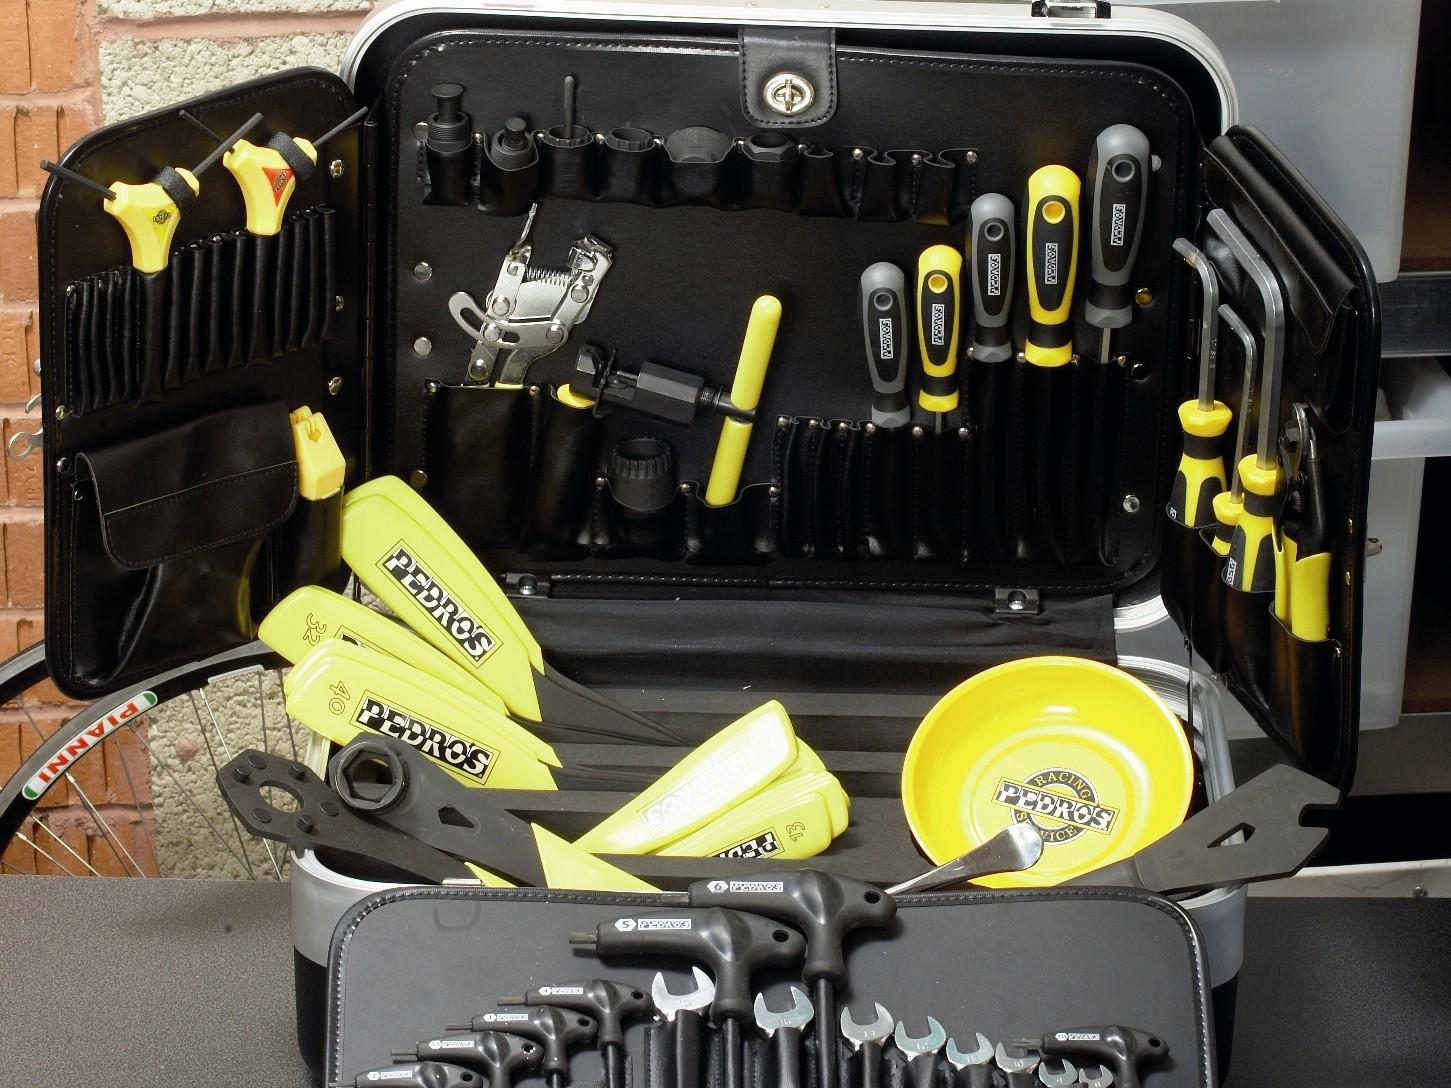 Pedro's are providing toolkits for mechanics in Zambia